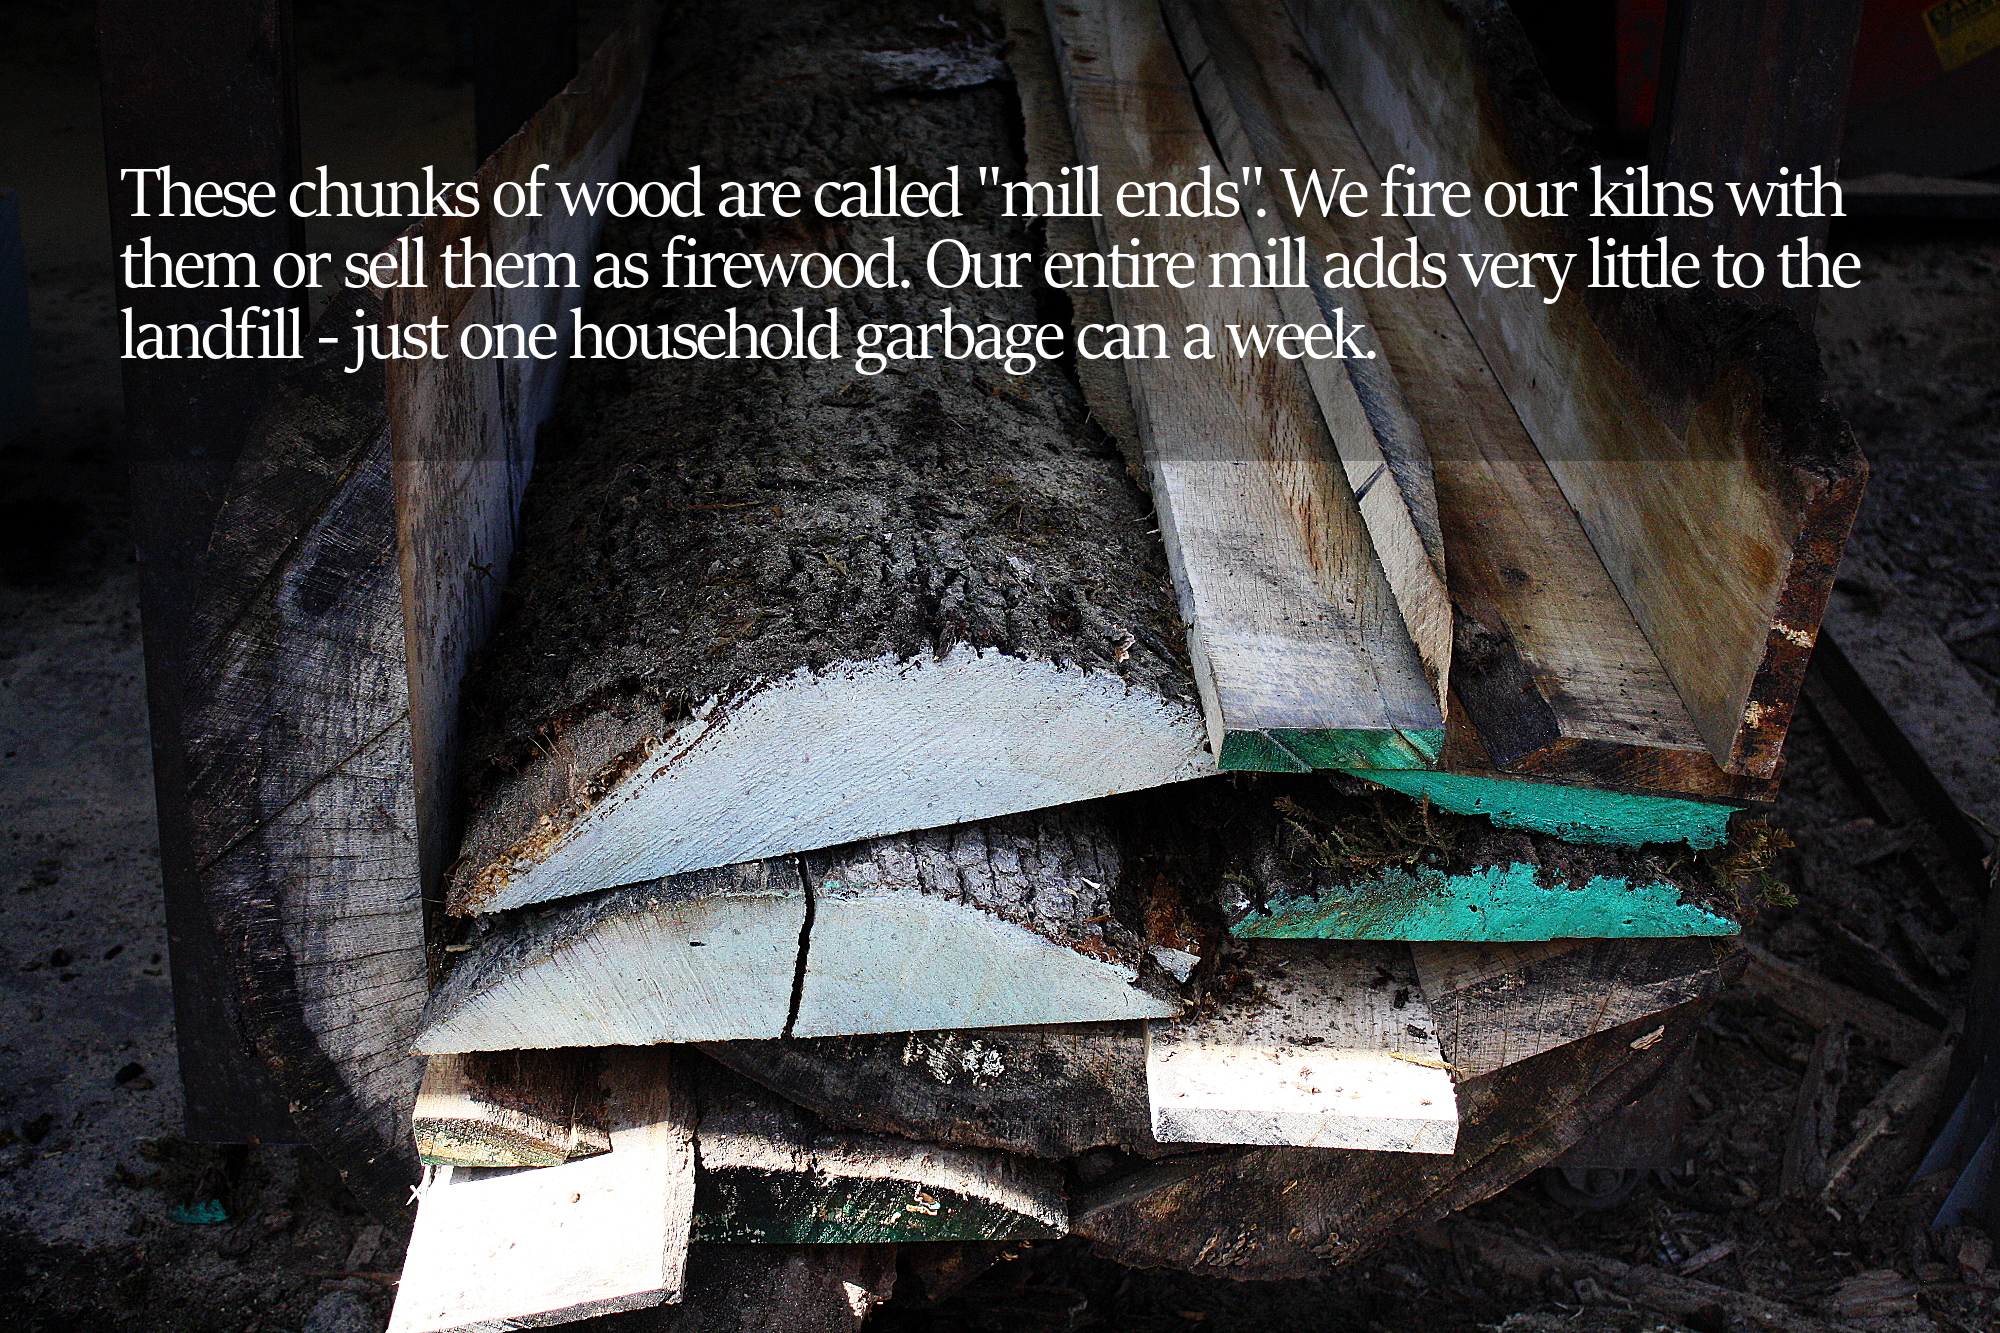 07firewoodcaption.jpg